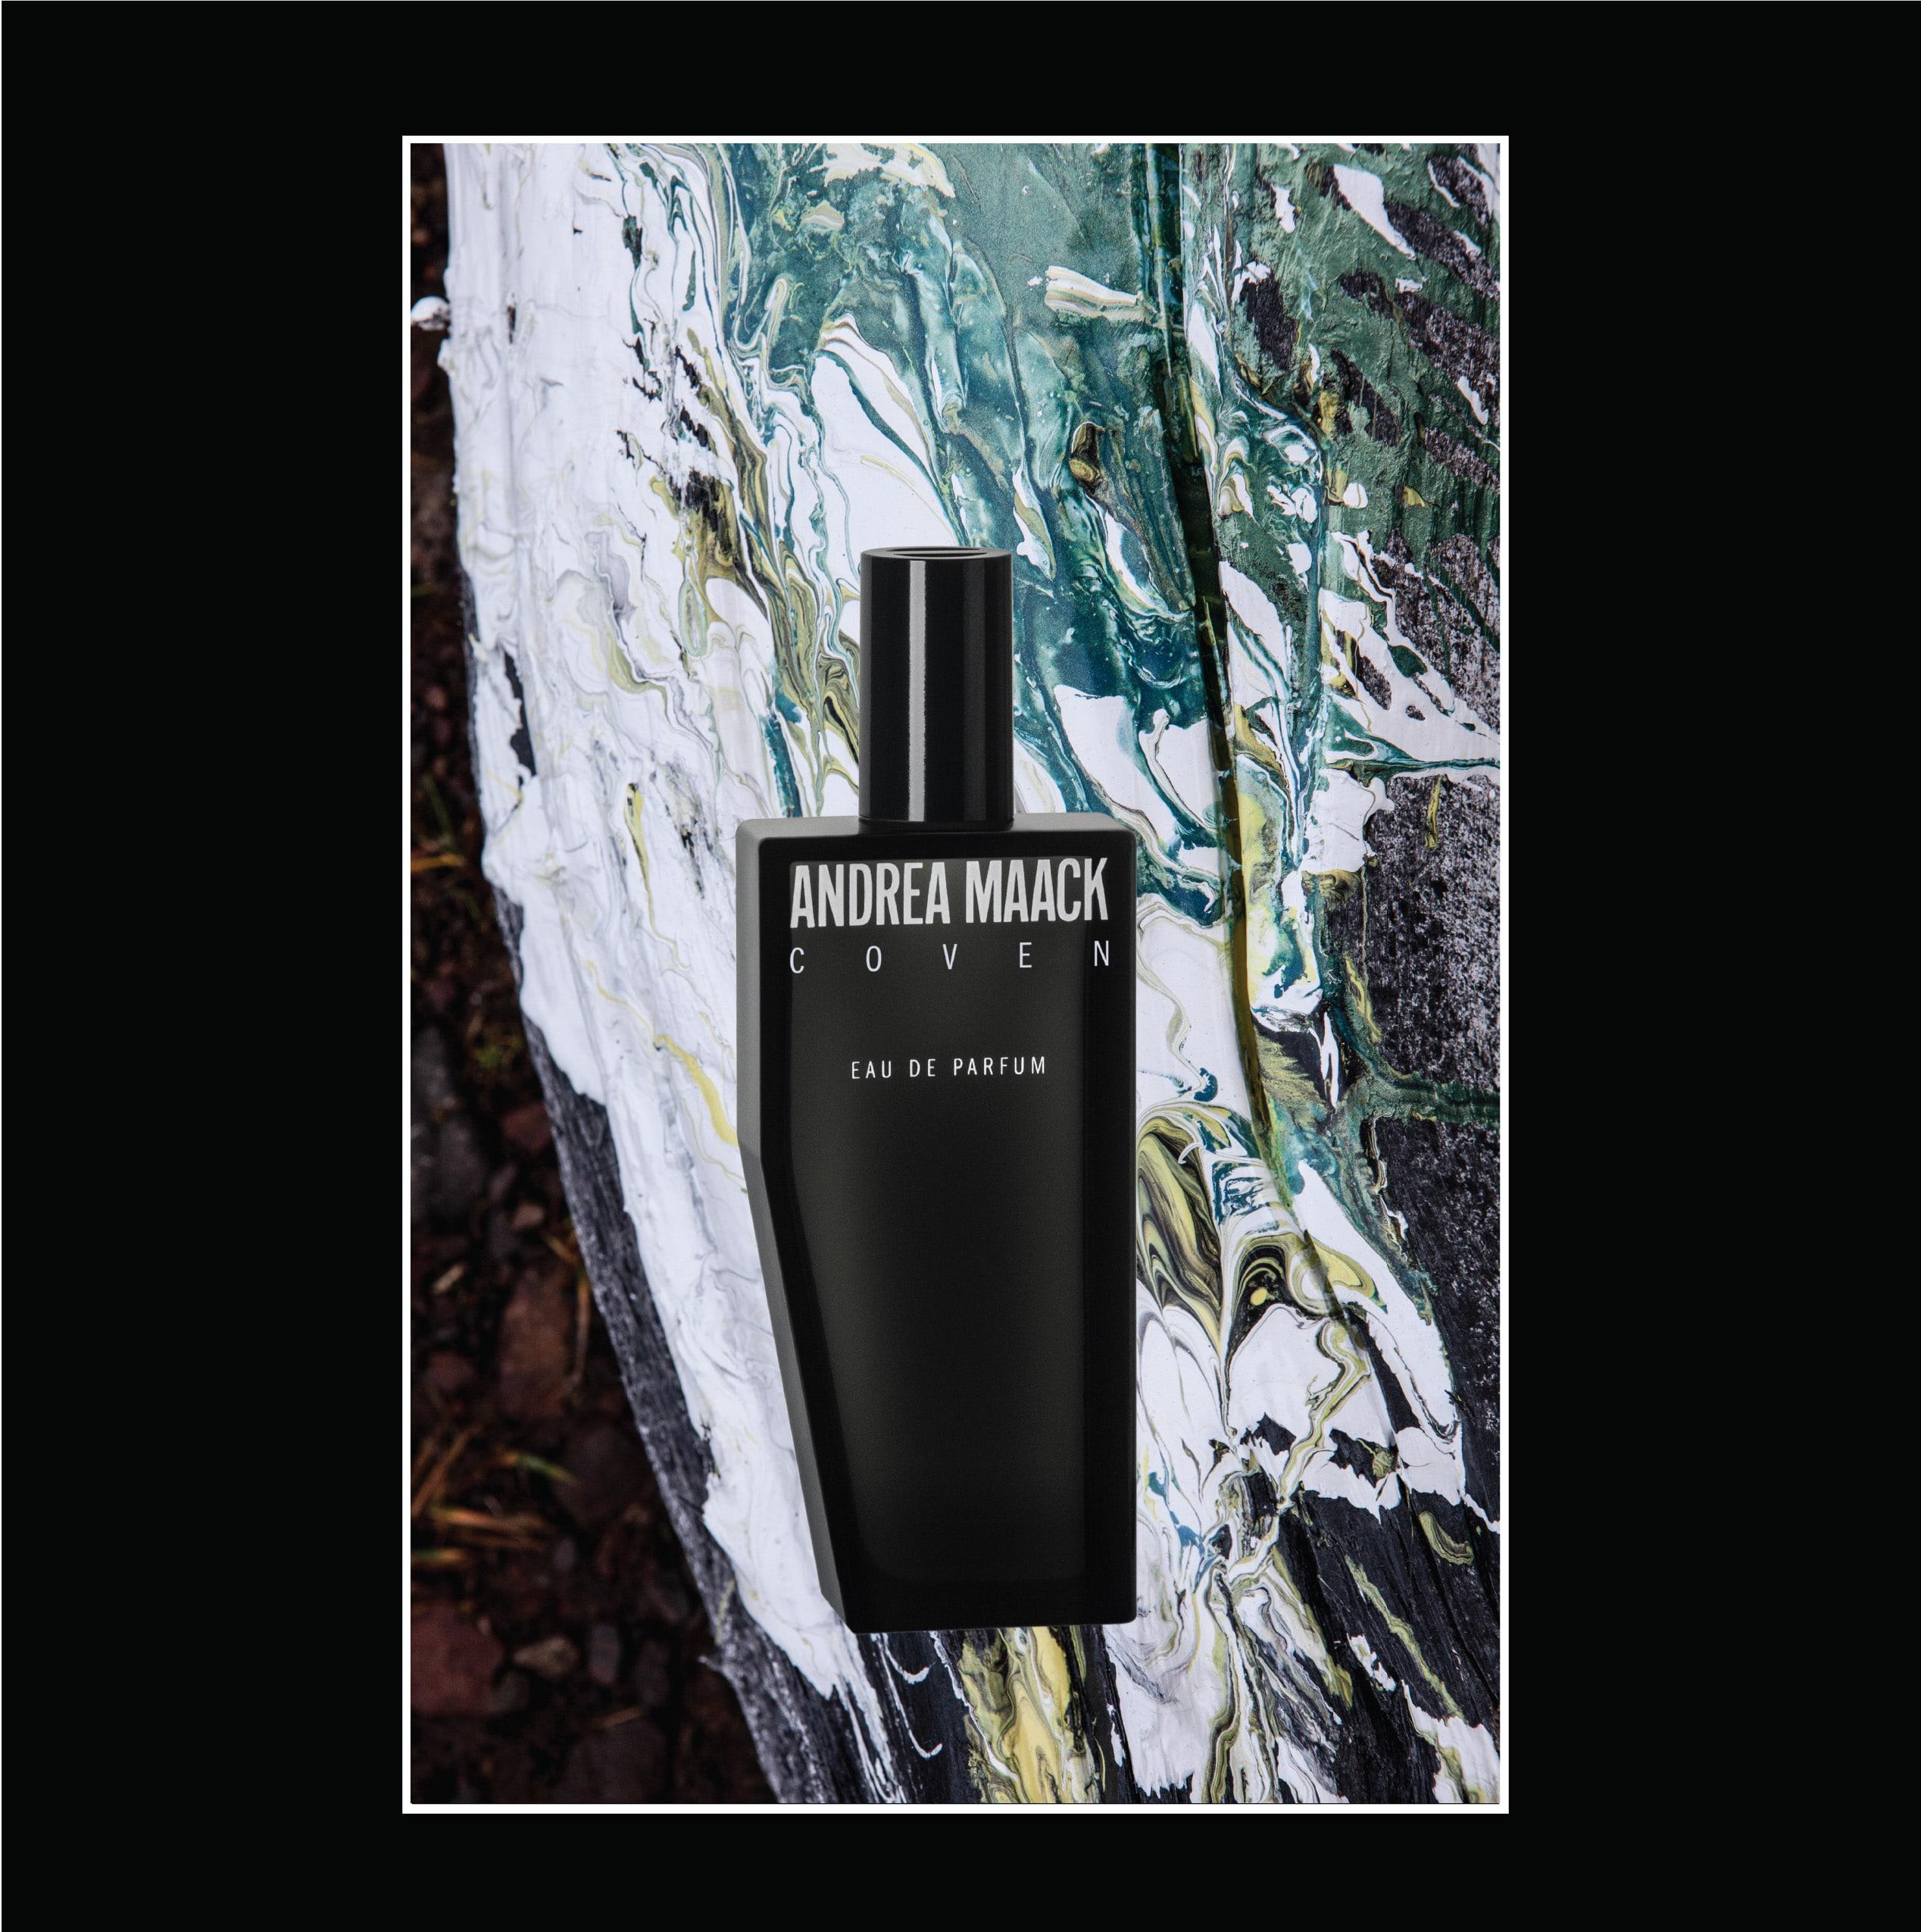 © ANDREA MAACK COVEN - erdiger und grün-metallischer Relaunch voller Magie und Mystik